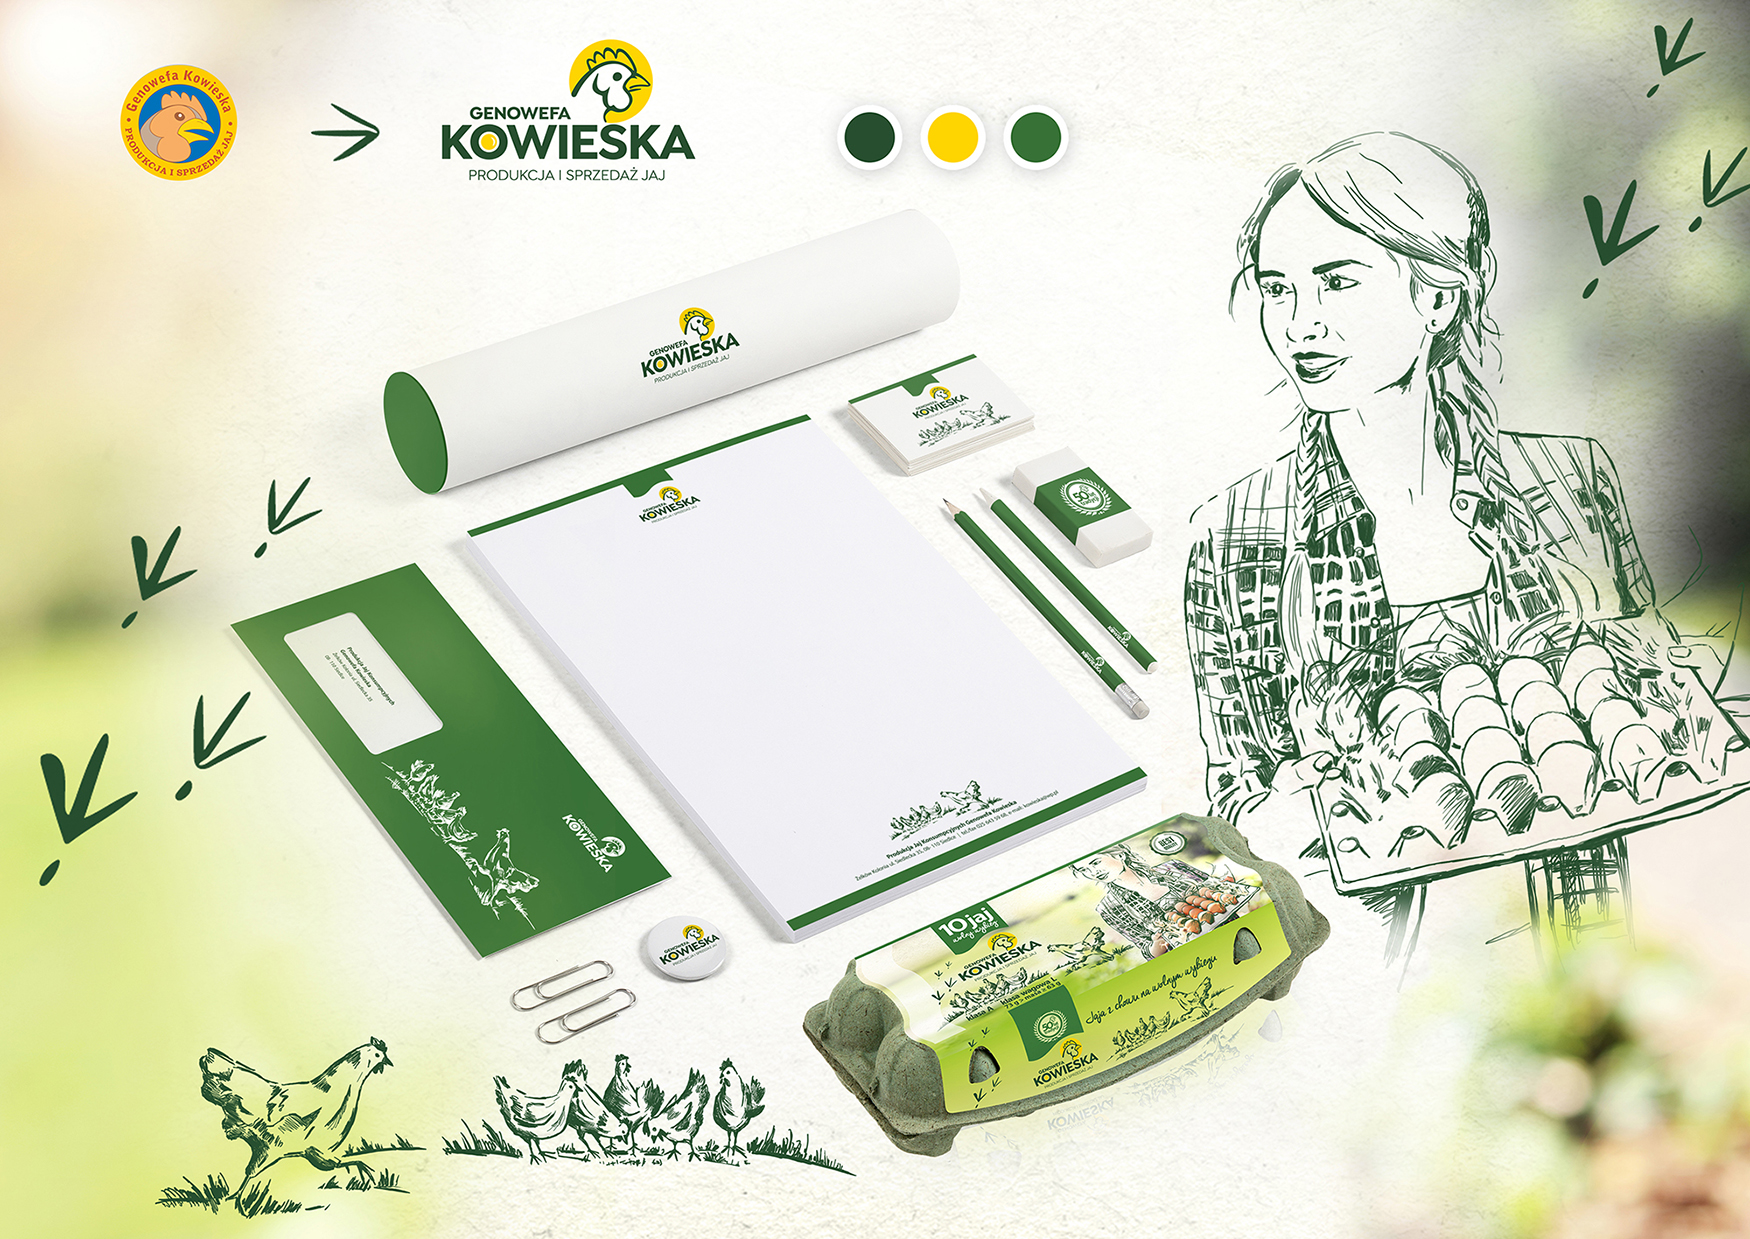 Kowieska